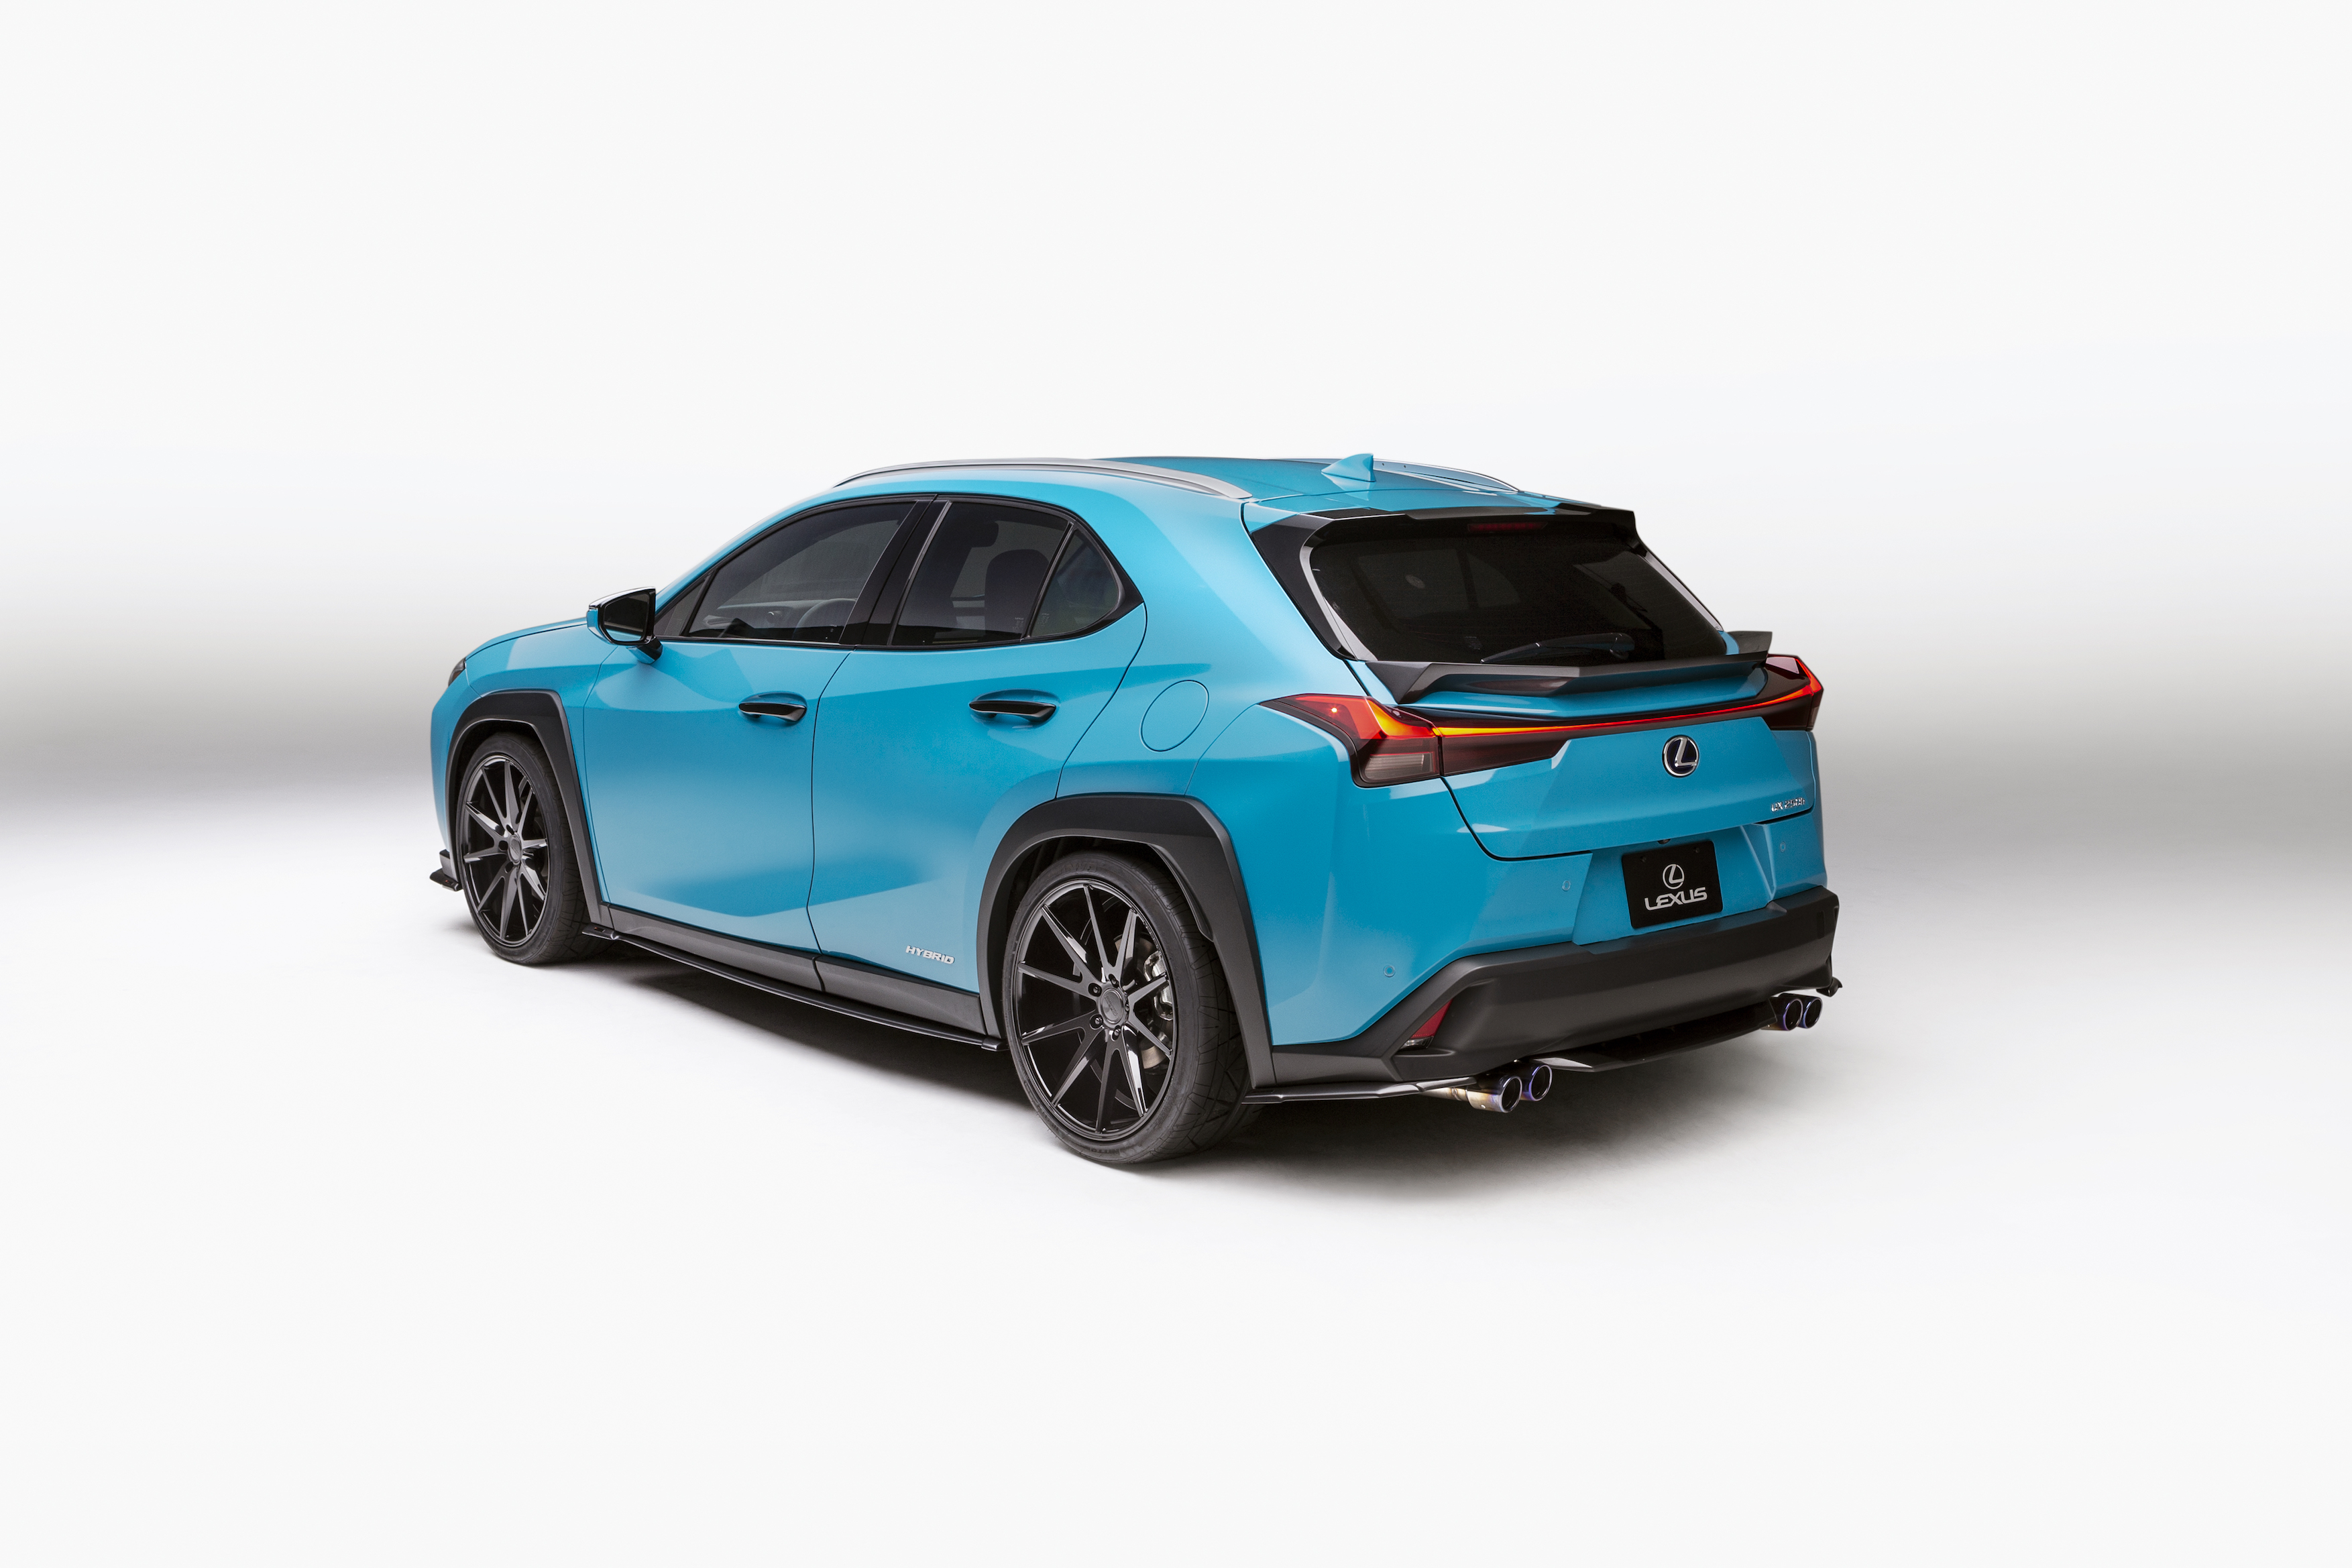 2019_Lexus_UX_001_9C377D9A31C7F9B54D6EF09B19B55B6B7D3BB9D9